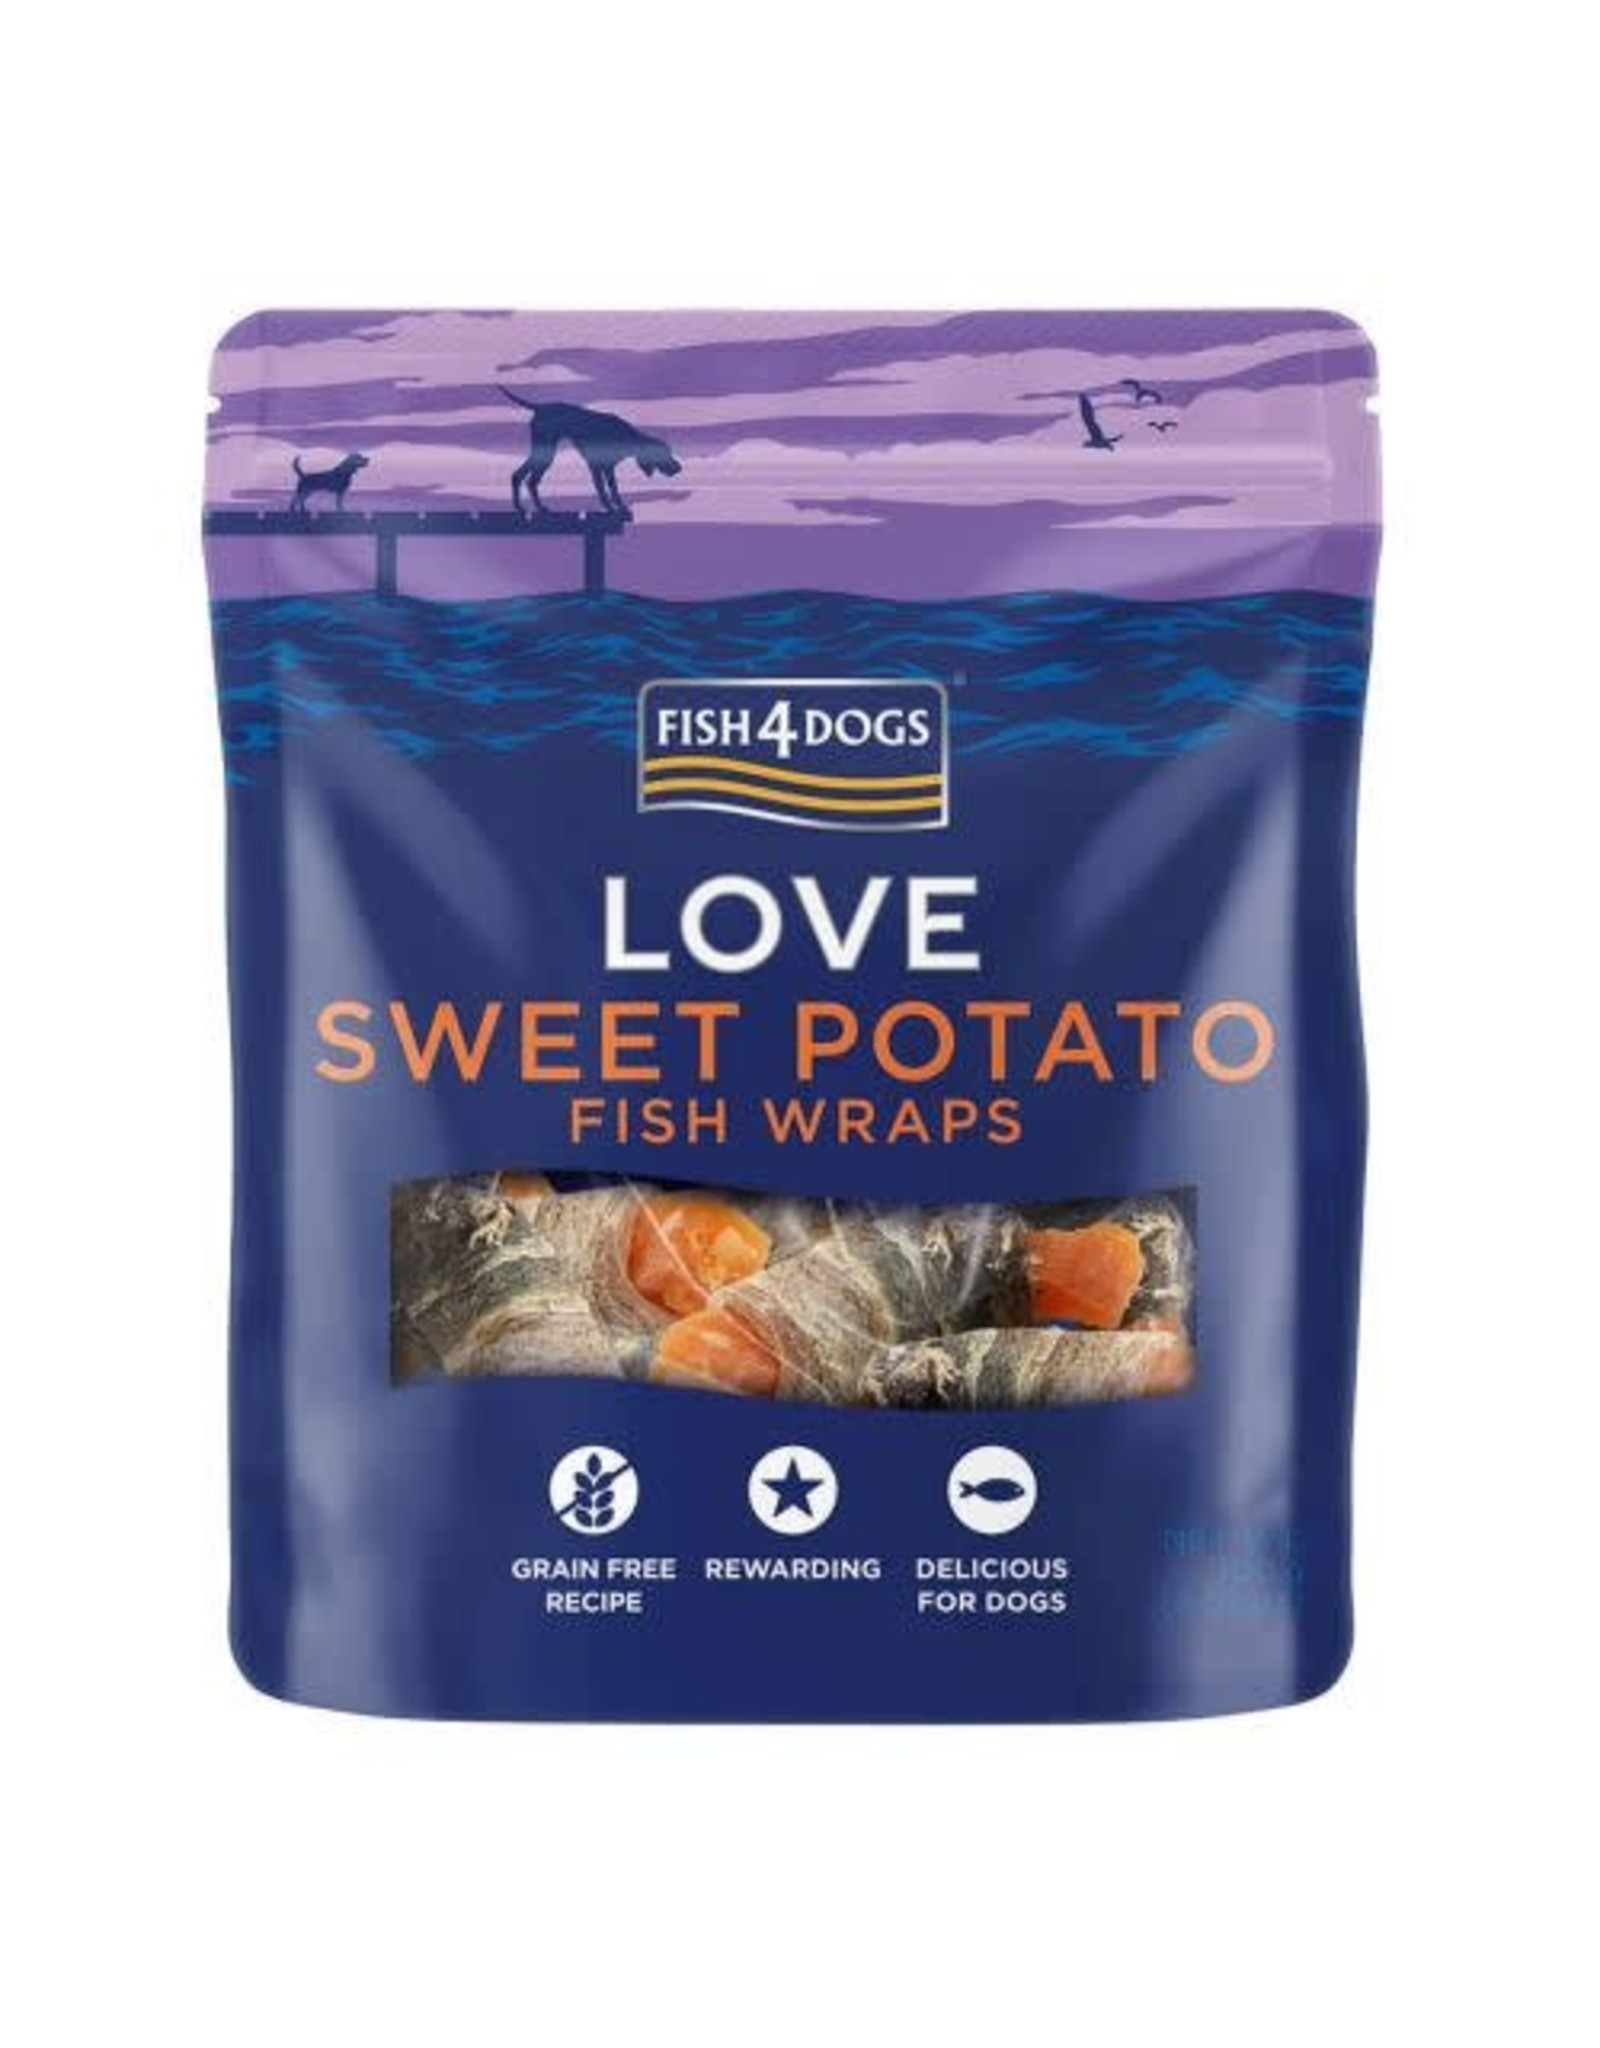 Fish4Dogs Love Sweet Potato Fish Wraps Dog Treats, 100g